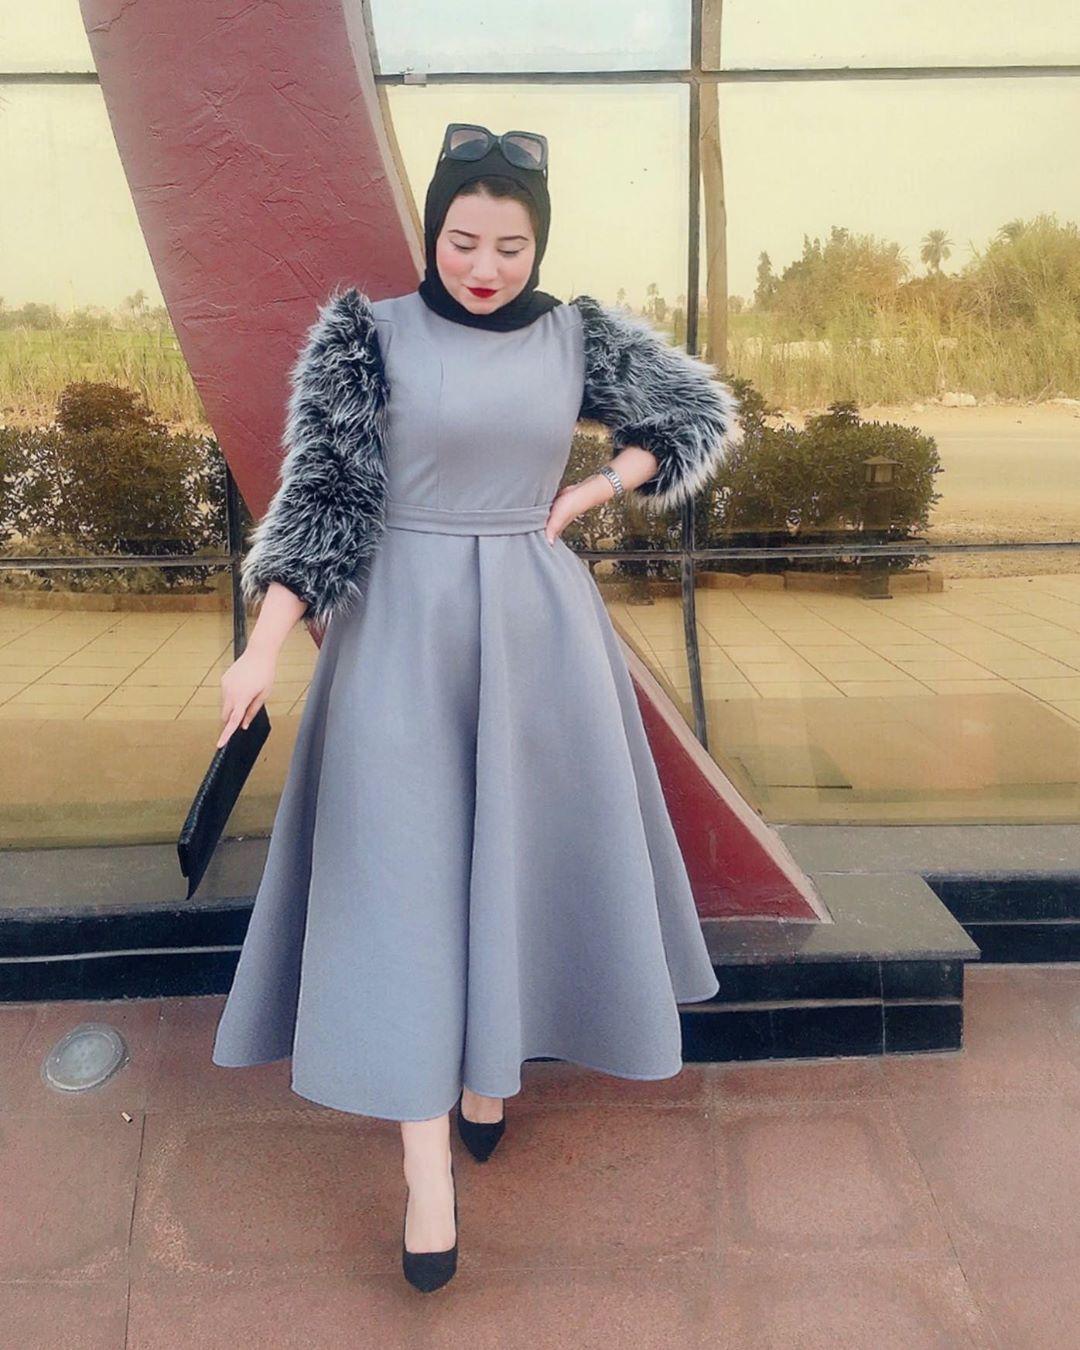 7 884 Mentions J Aime 120 Commentaires Omneia Zidan أمنية زيدان Monya Zidan Sur Muslim Fashion Outfits Muslim Fashion Dress Muslimah Fashion Outfits